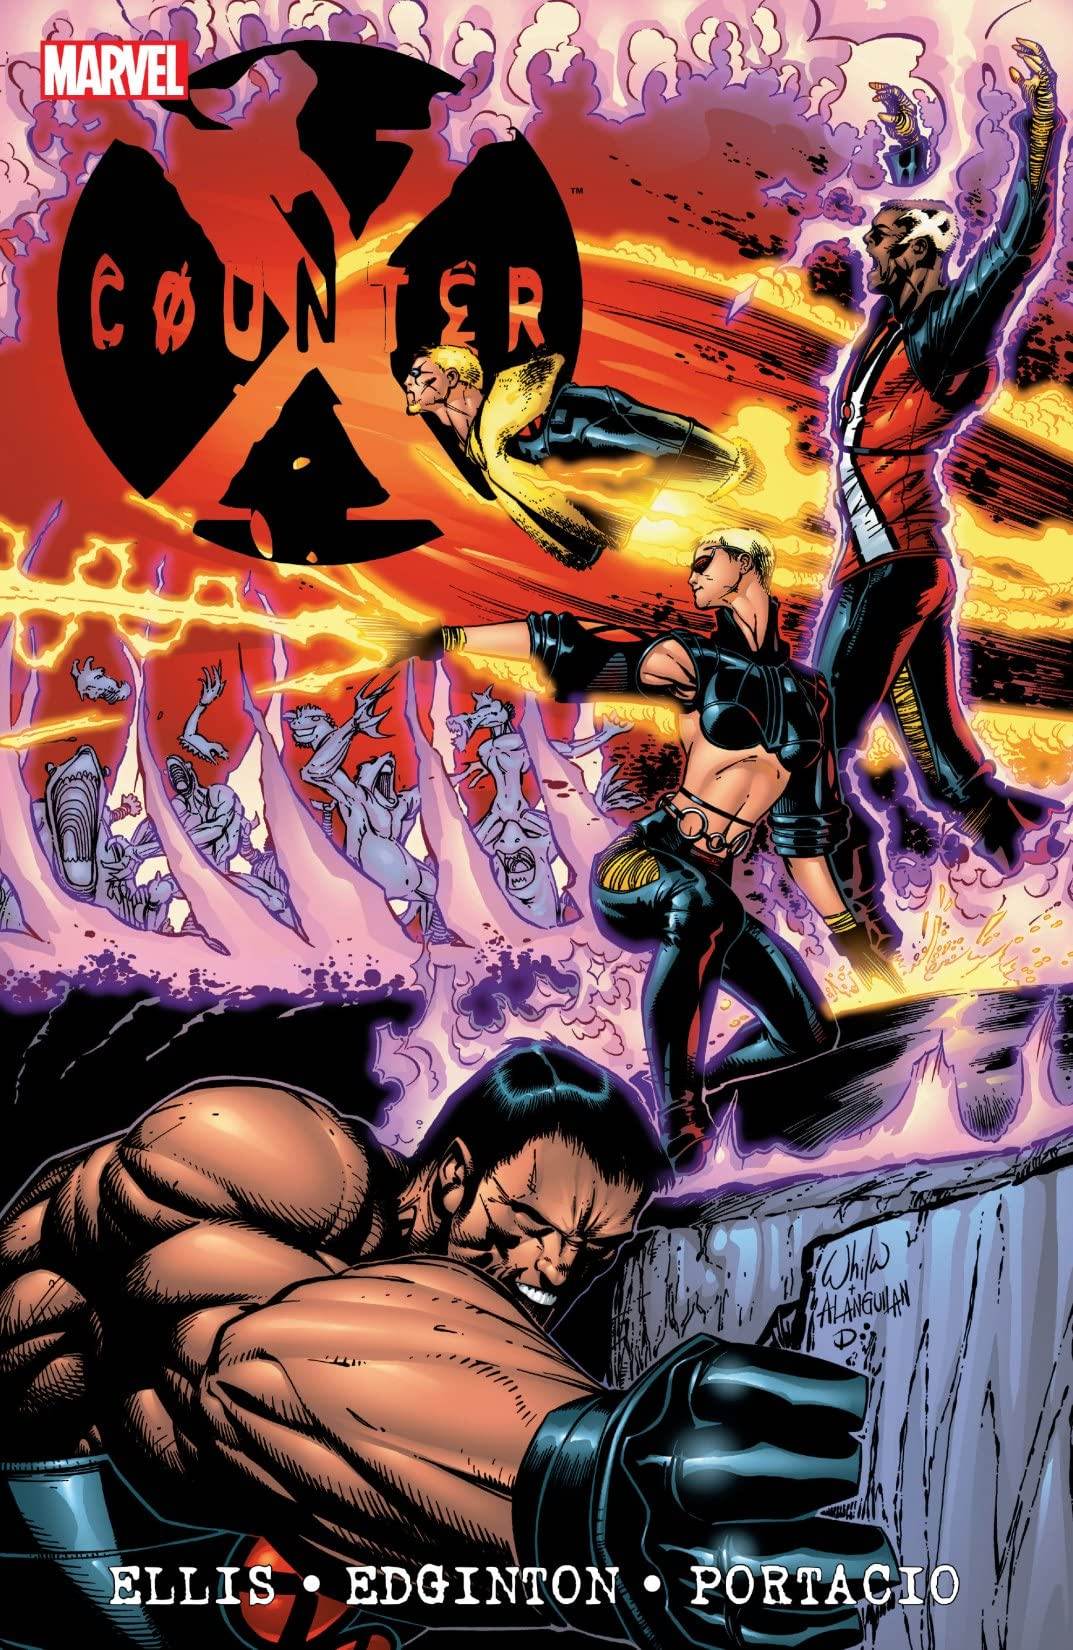 Counter X Vol. 1